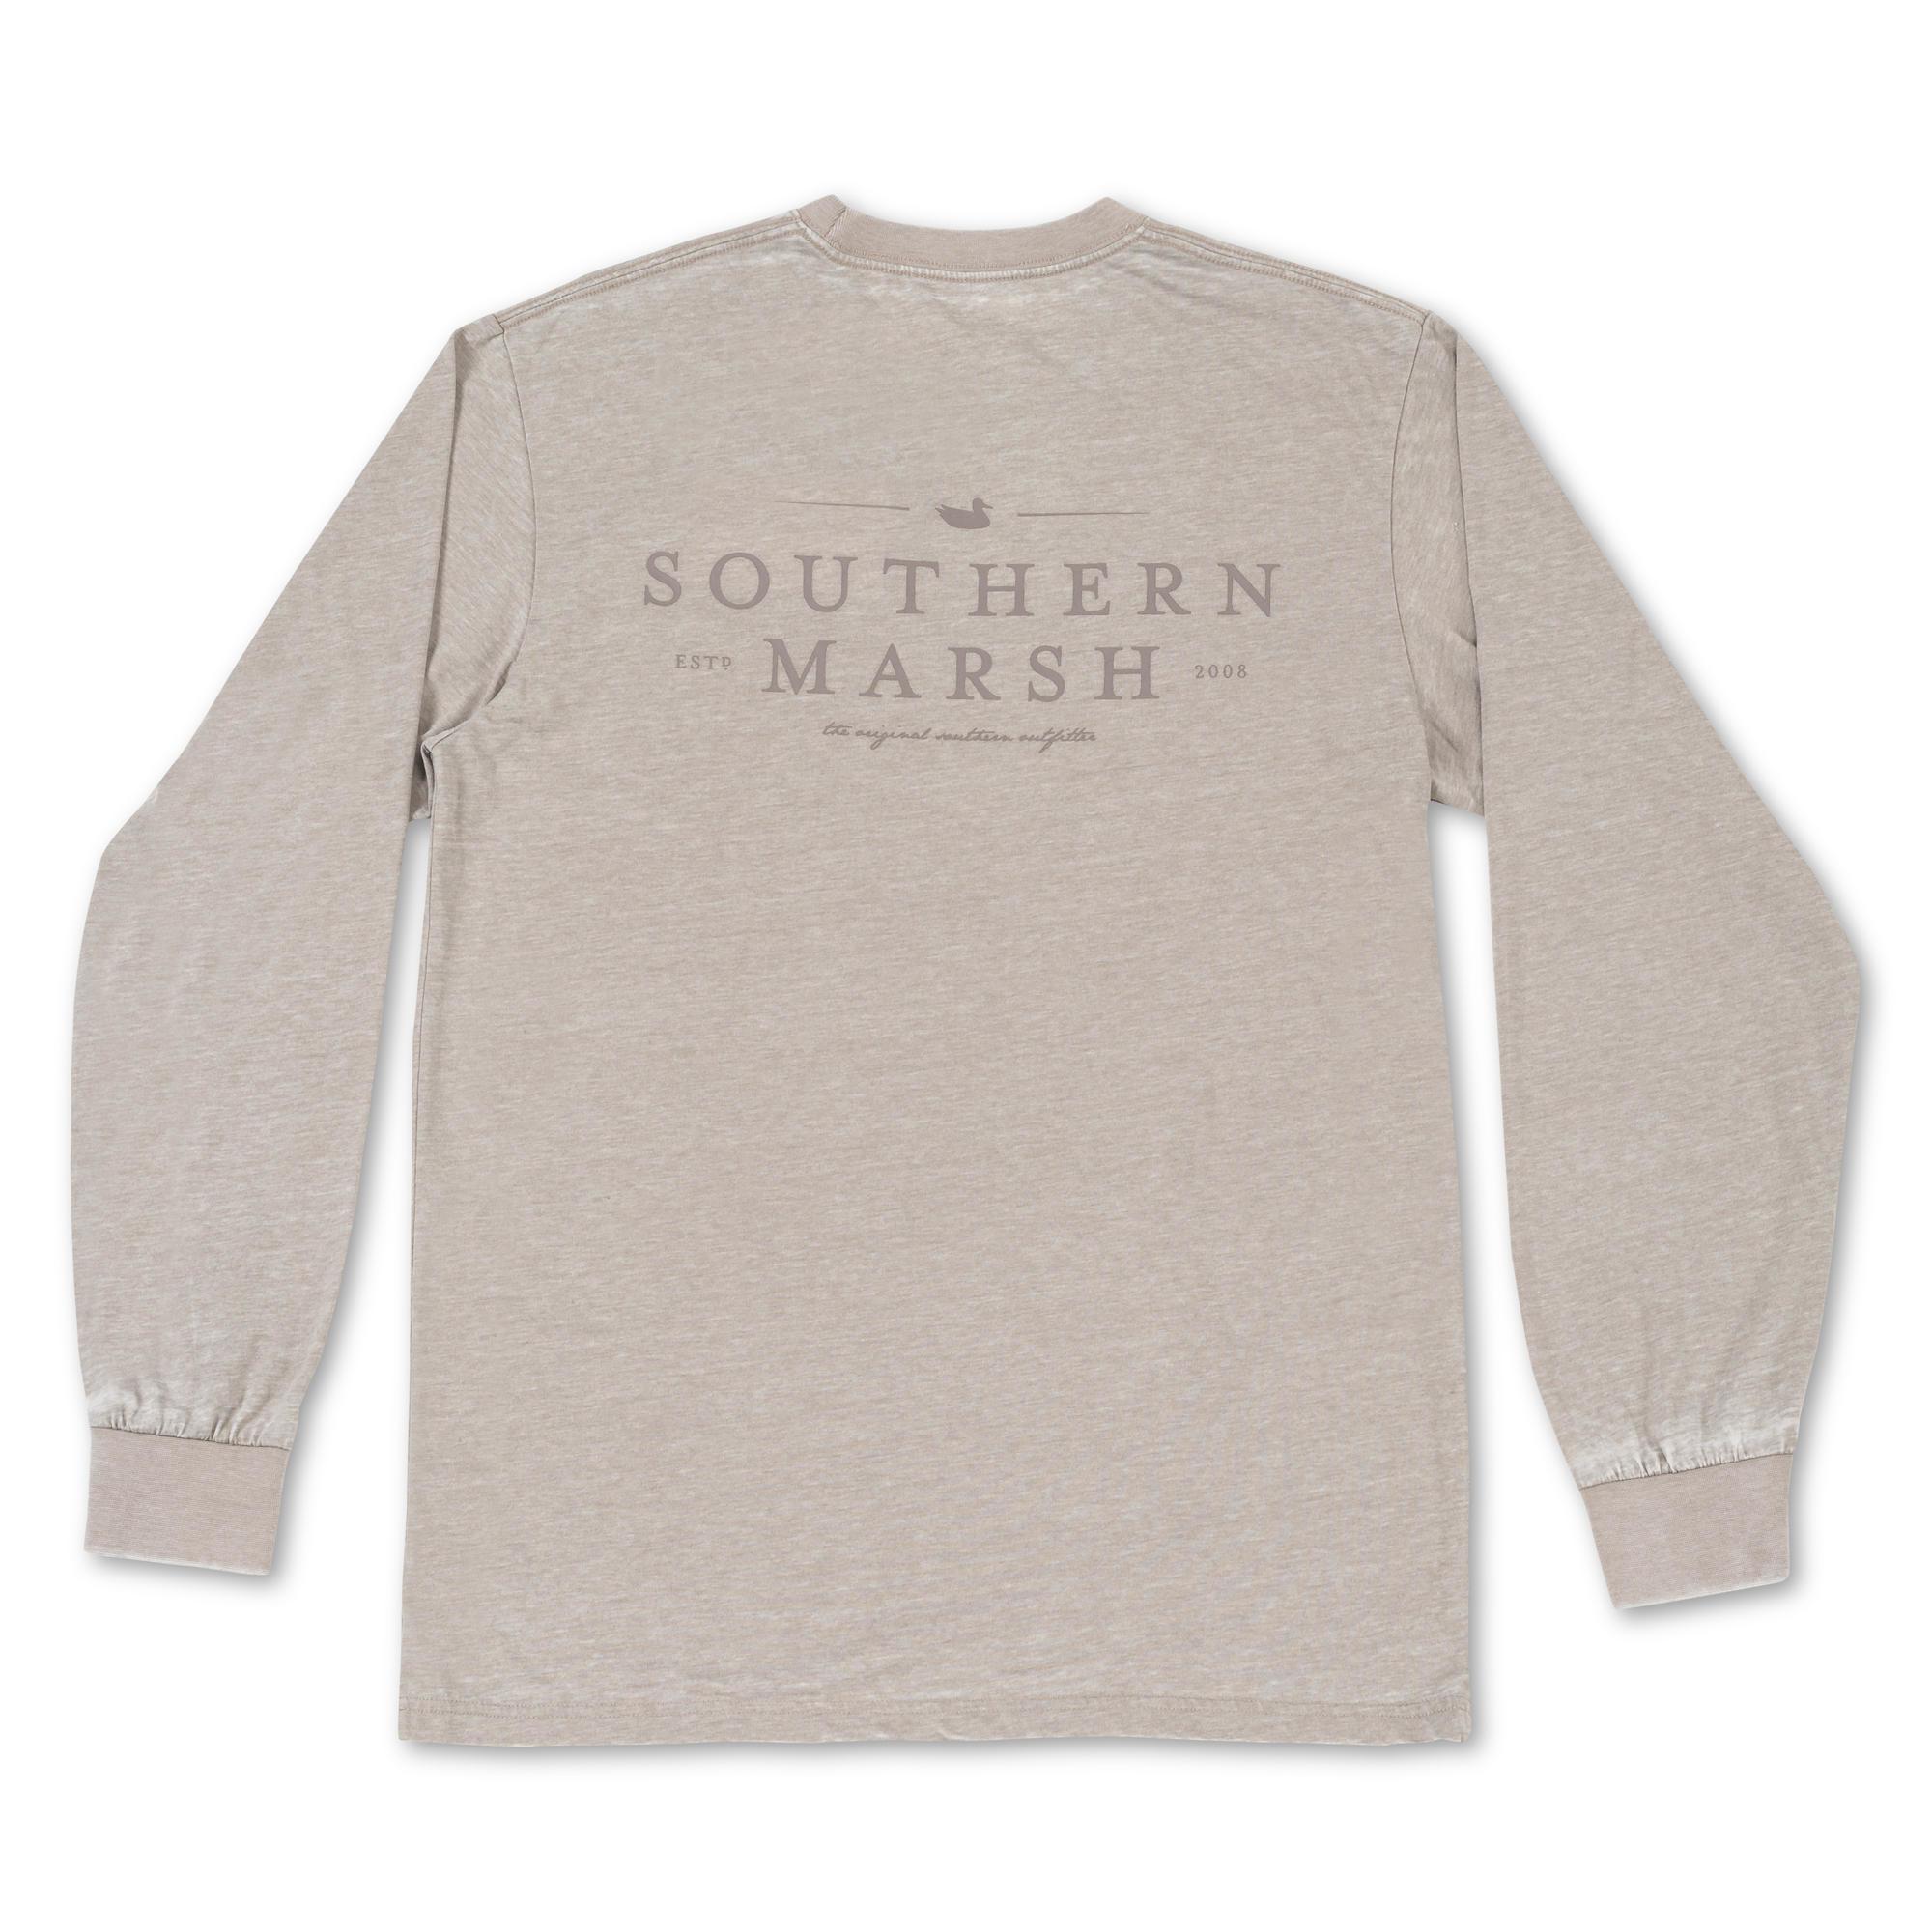 Southern Marsh SEAWASH™ Tee - Classic - Long Sleeve